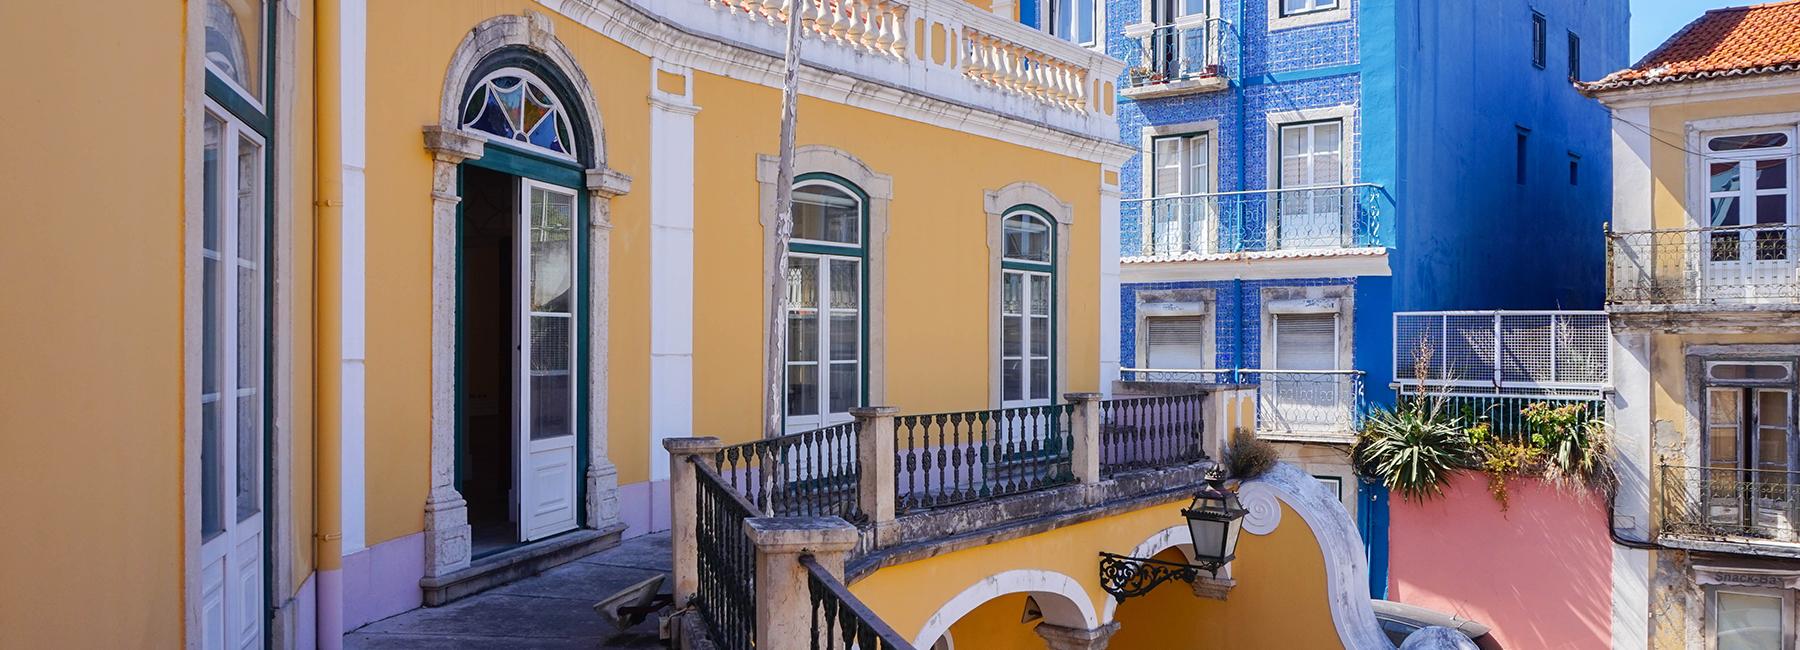 <a href='/imovel/palacete-no-rato-com-jardim-ideal-para-hotel-ou-empresa-lisboa/?rid=6751828' target=''>Rato - Prédio</a>